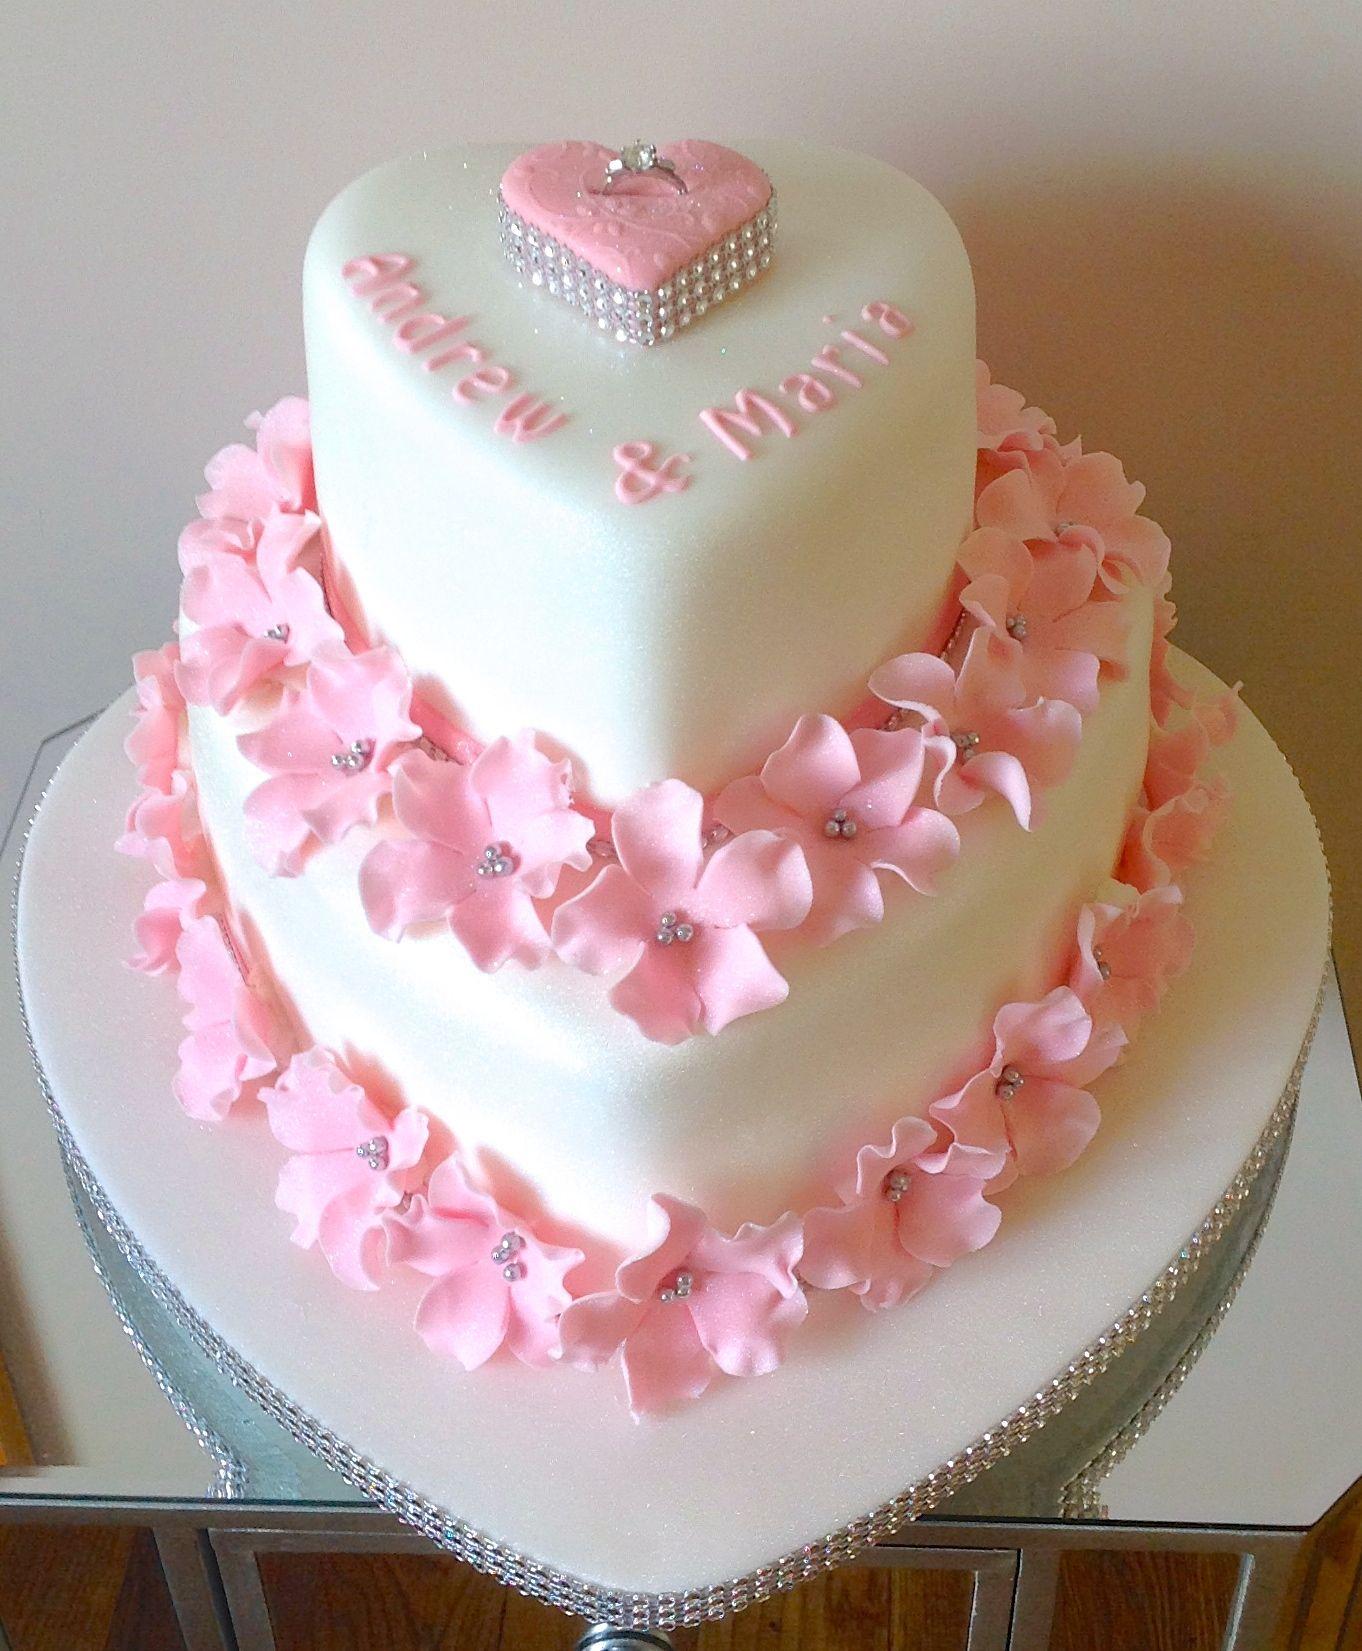 Pin by Leocadia Sanchez on pintada | Pinterest | Cake, Wedding Cake ...